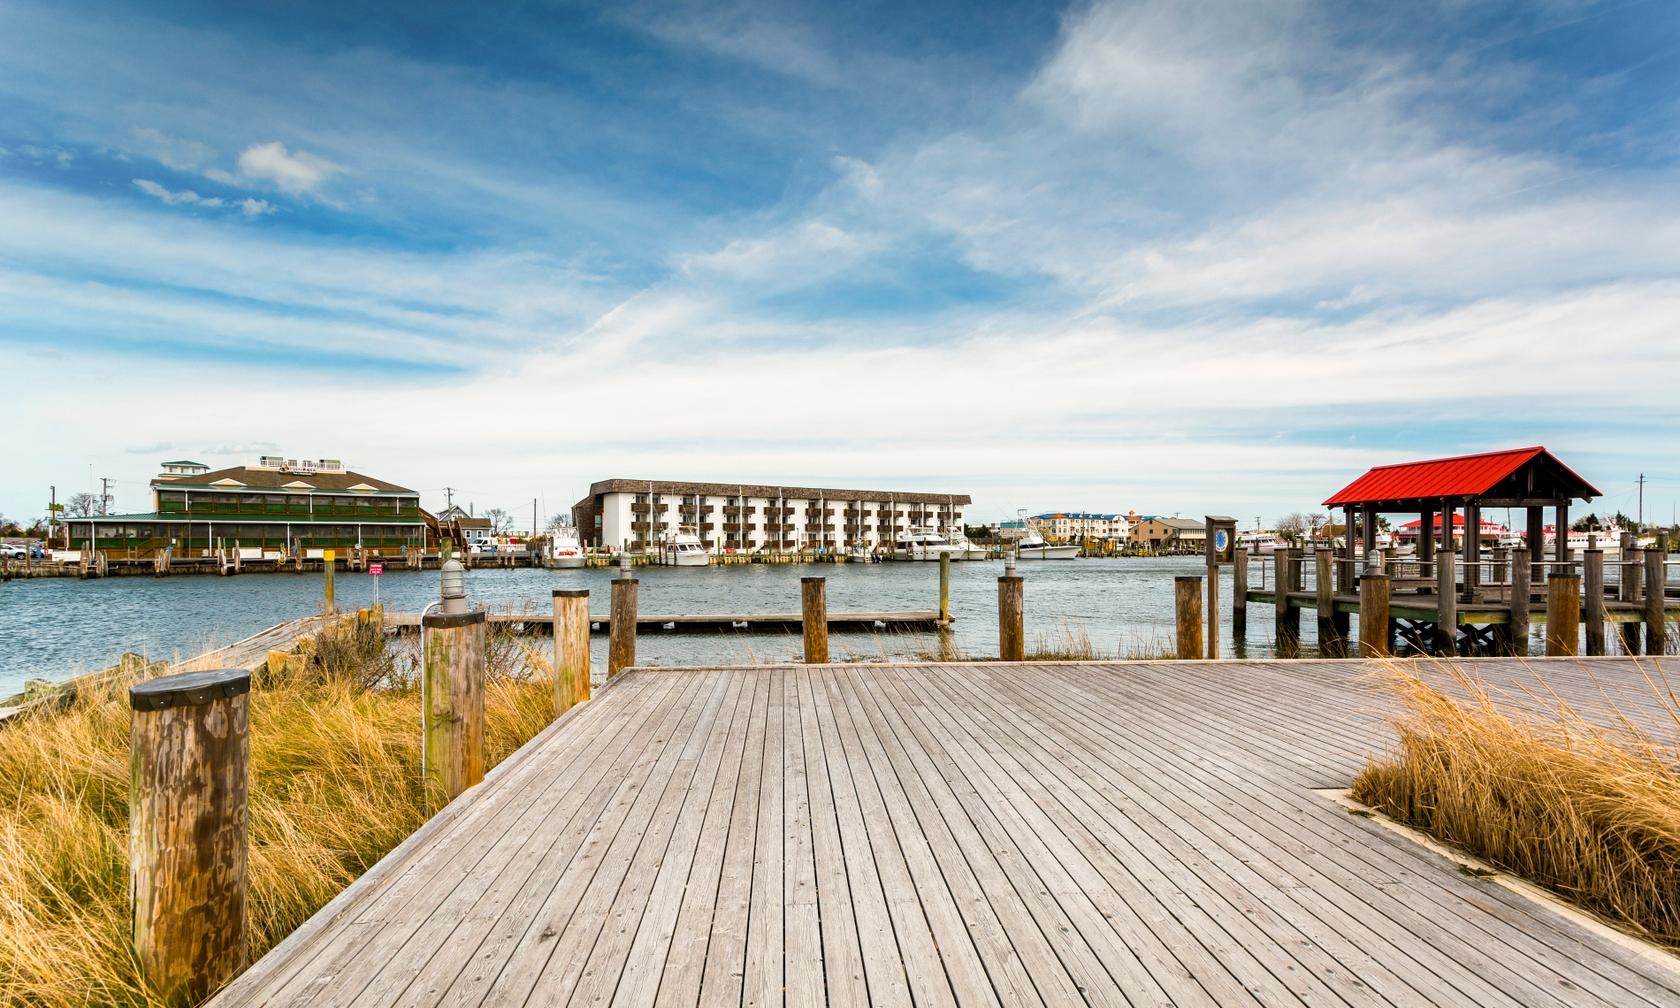 Vacation rental beach houses in Rehoboth Beach